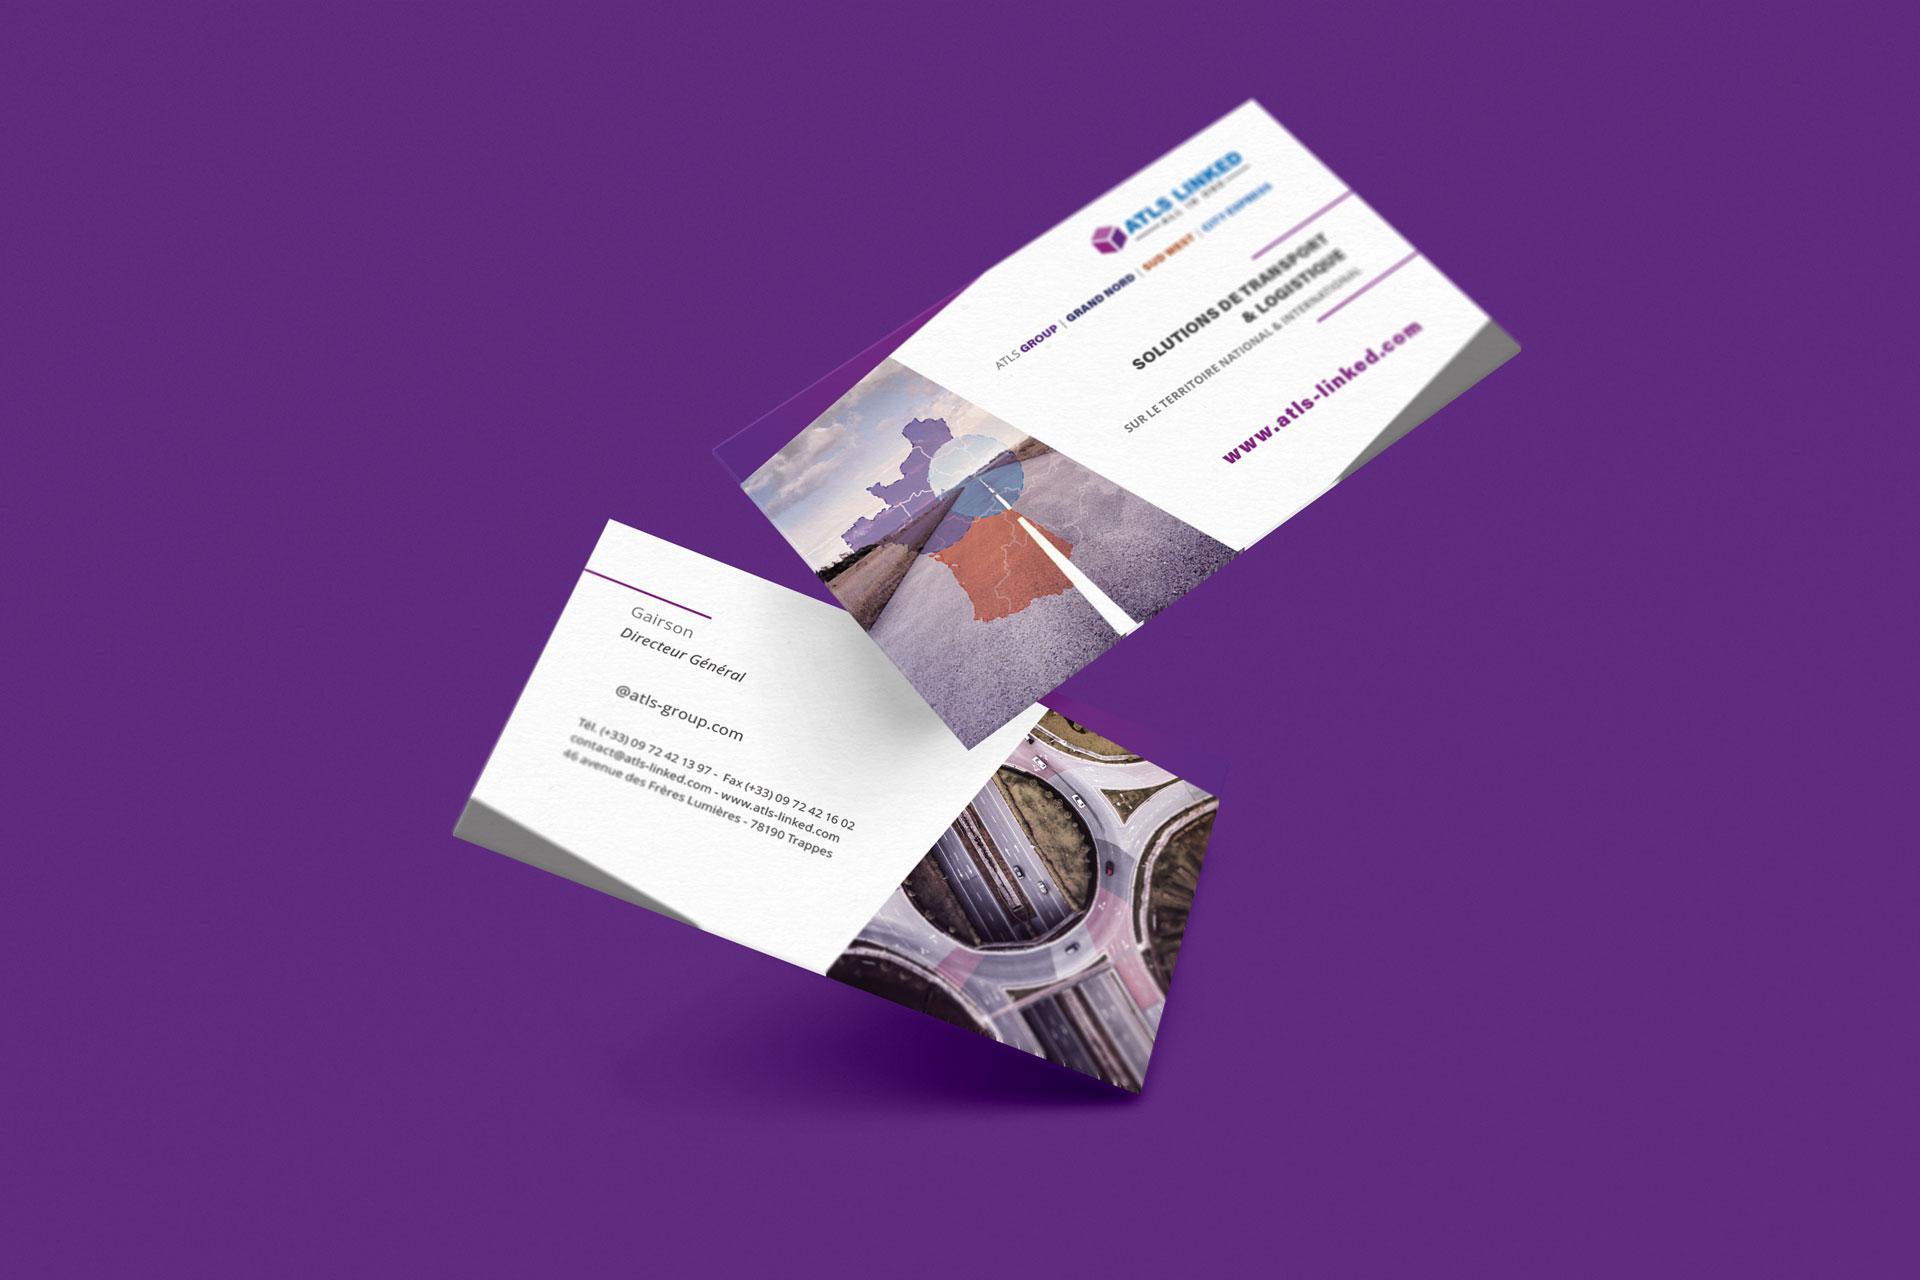 mockup carte de visite atls rouen client i-media agence de communication digitale